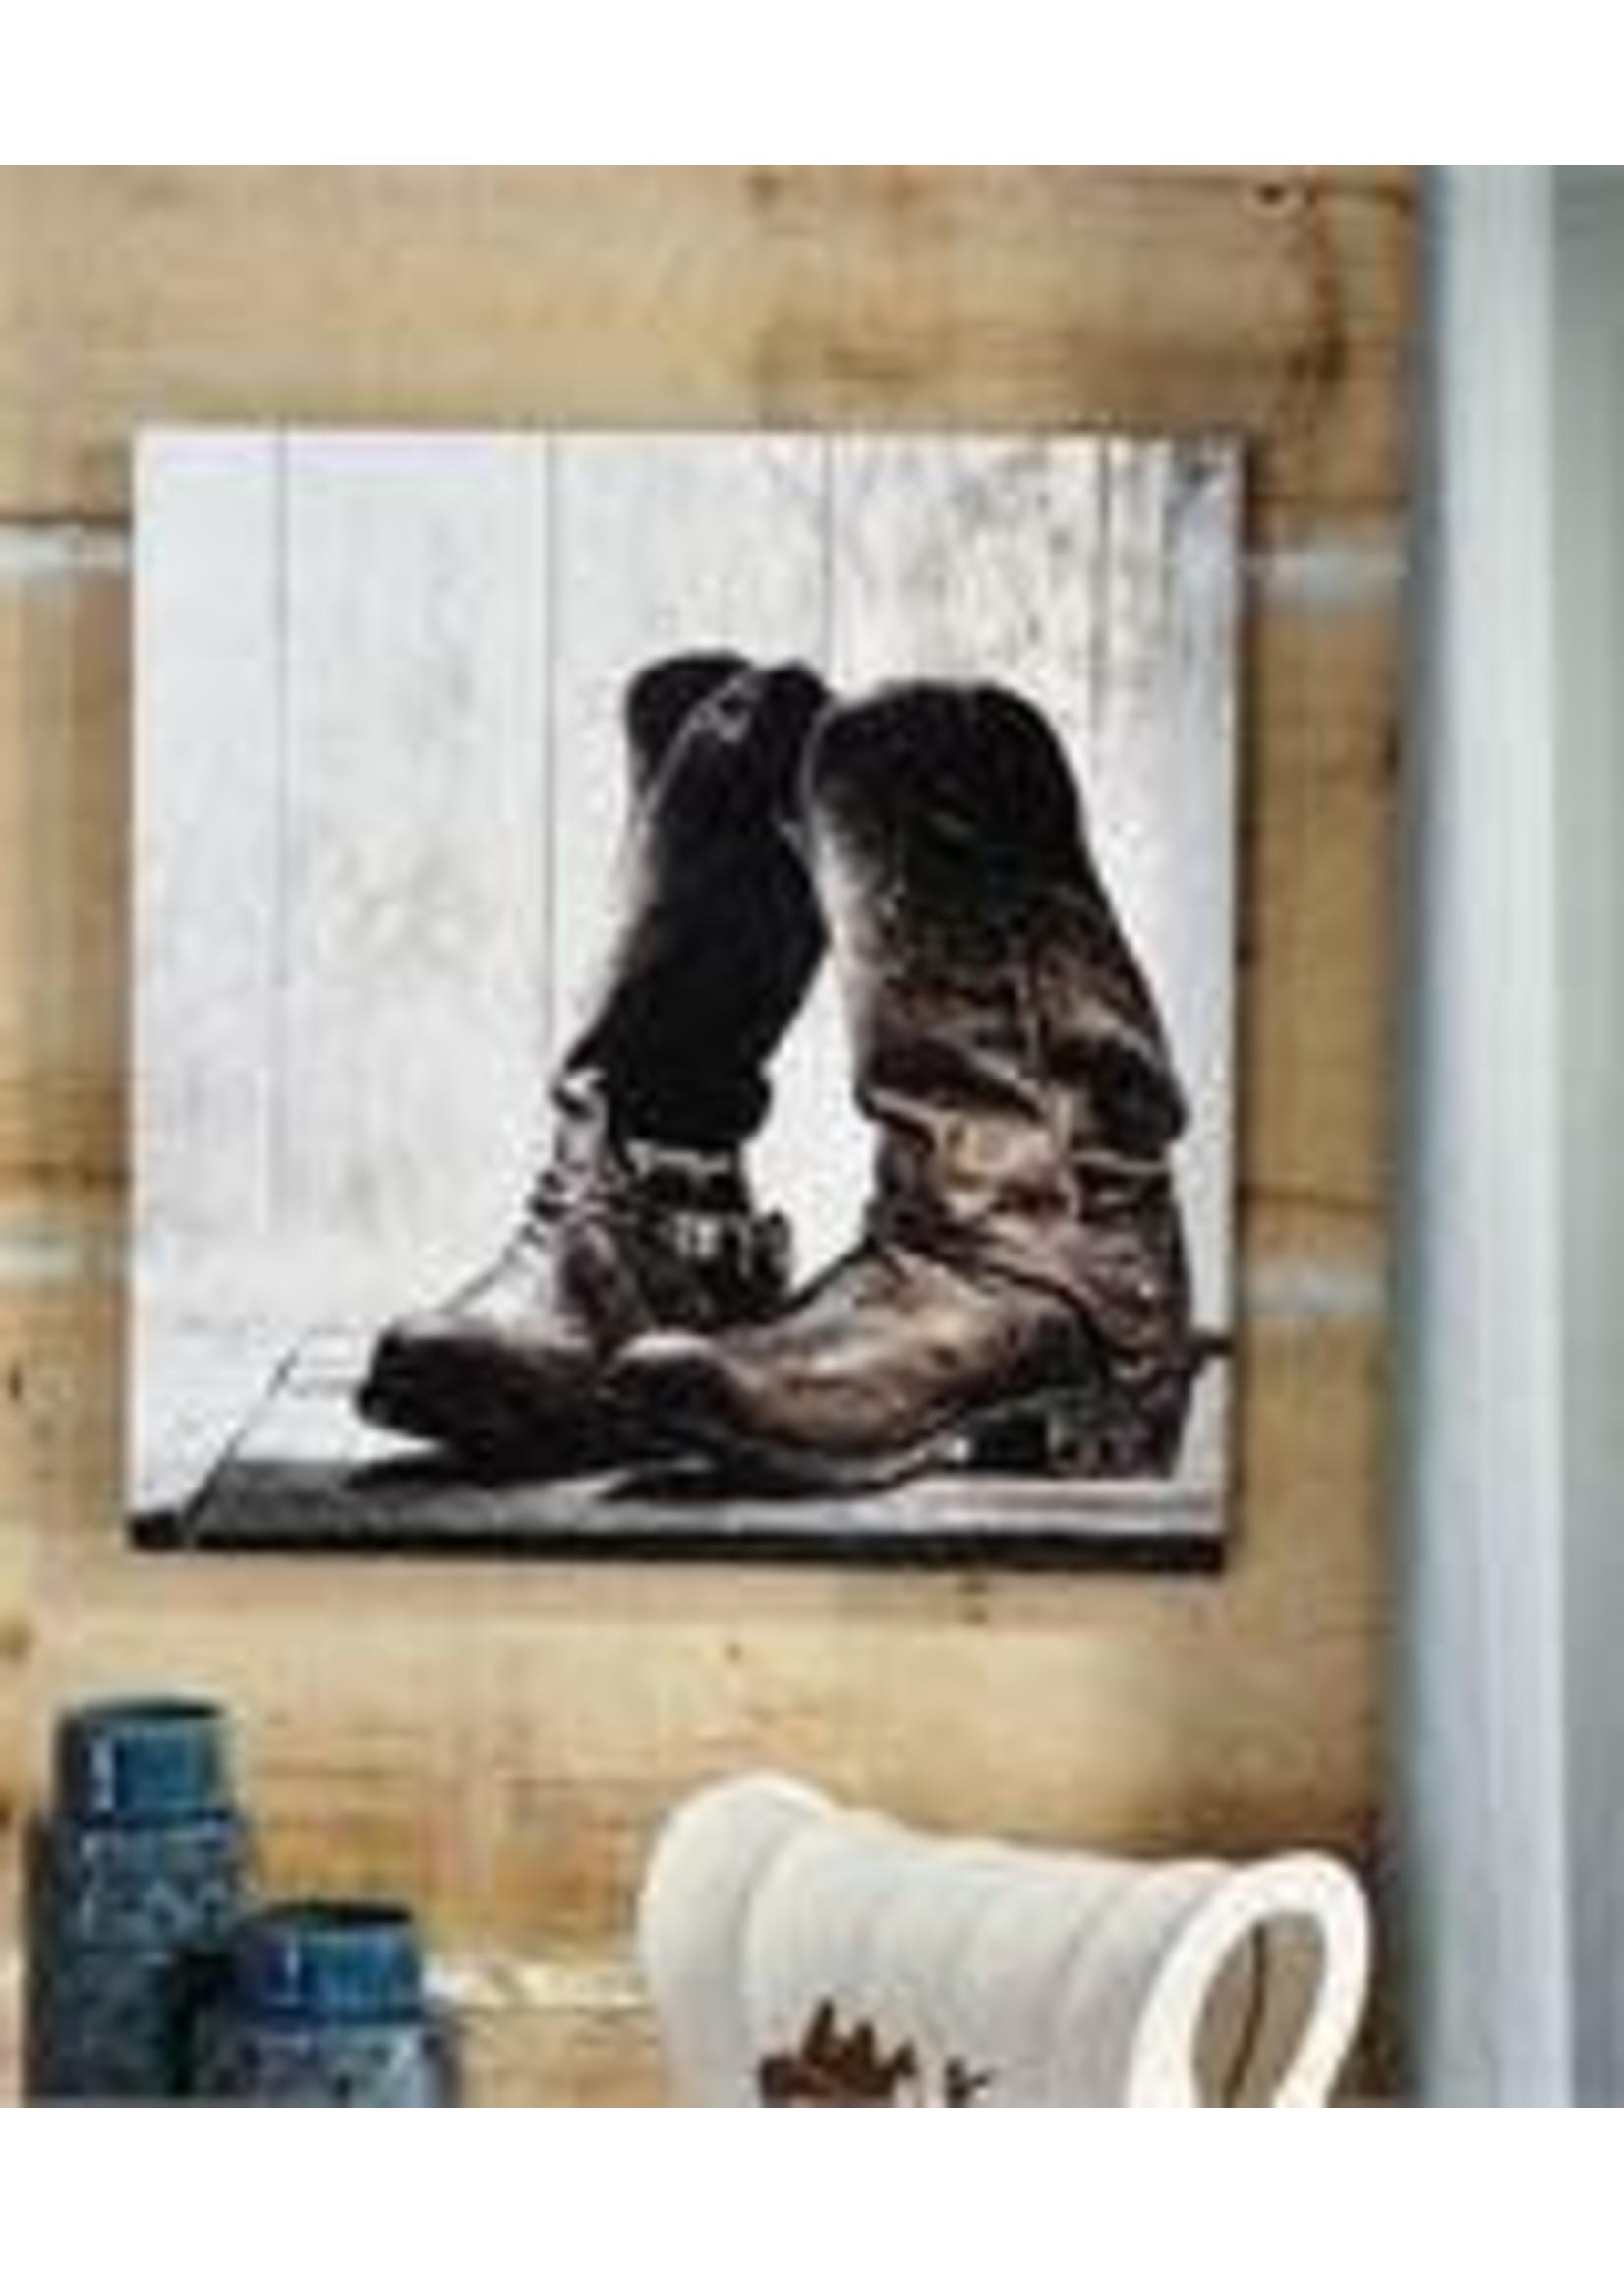 GIFTCRAFT WALL DECOR WALL PRINT COWBOY BOOTS